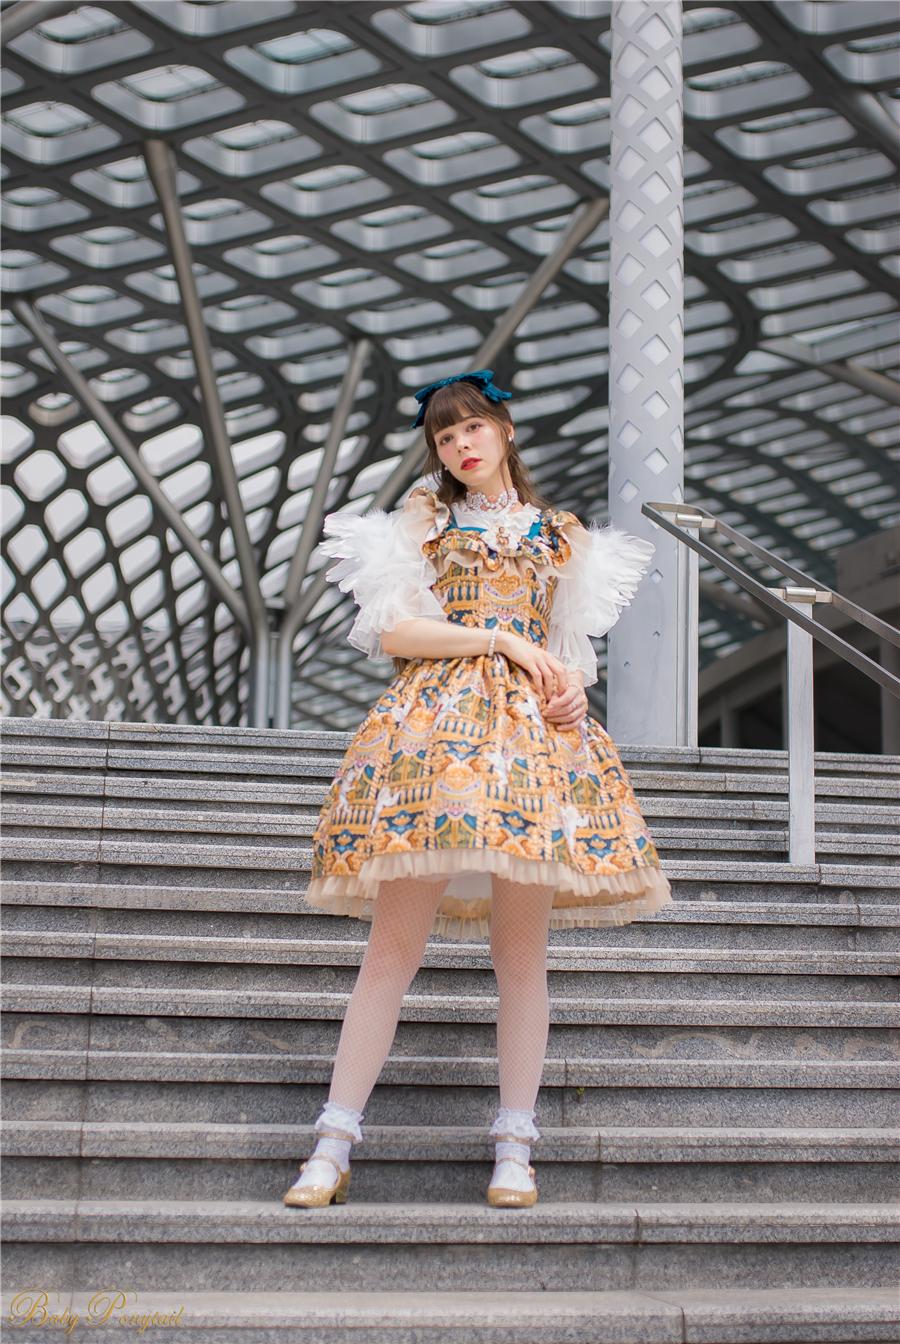 Babyponytail_Model_Ruffle Collar JSK_Tiel Angel_2_Claudia_7.jpg